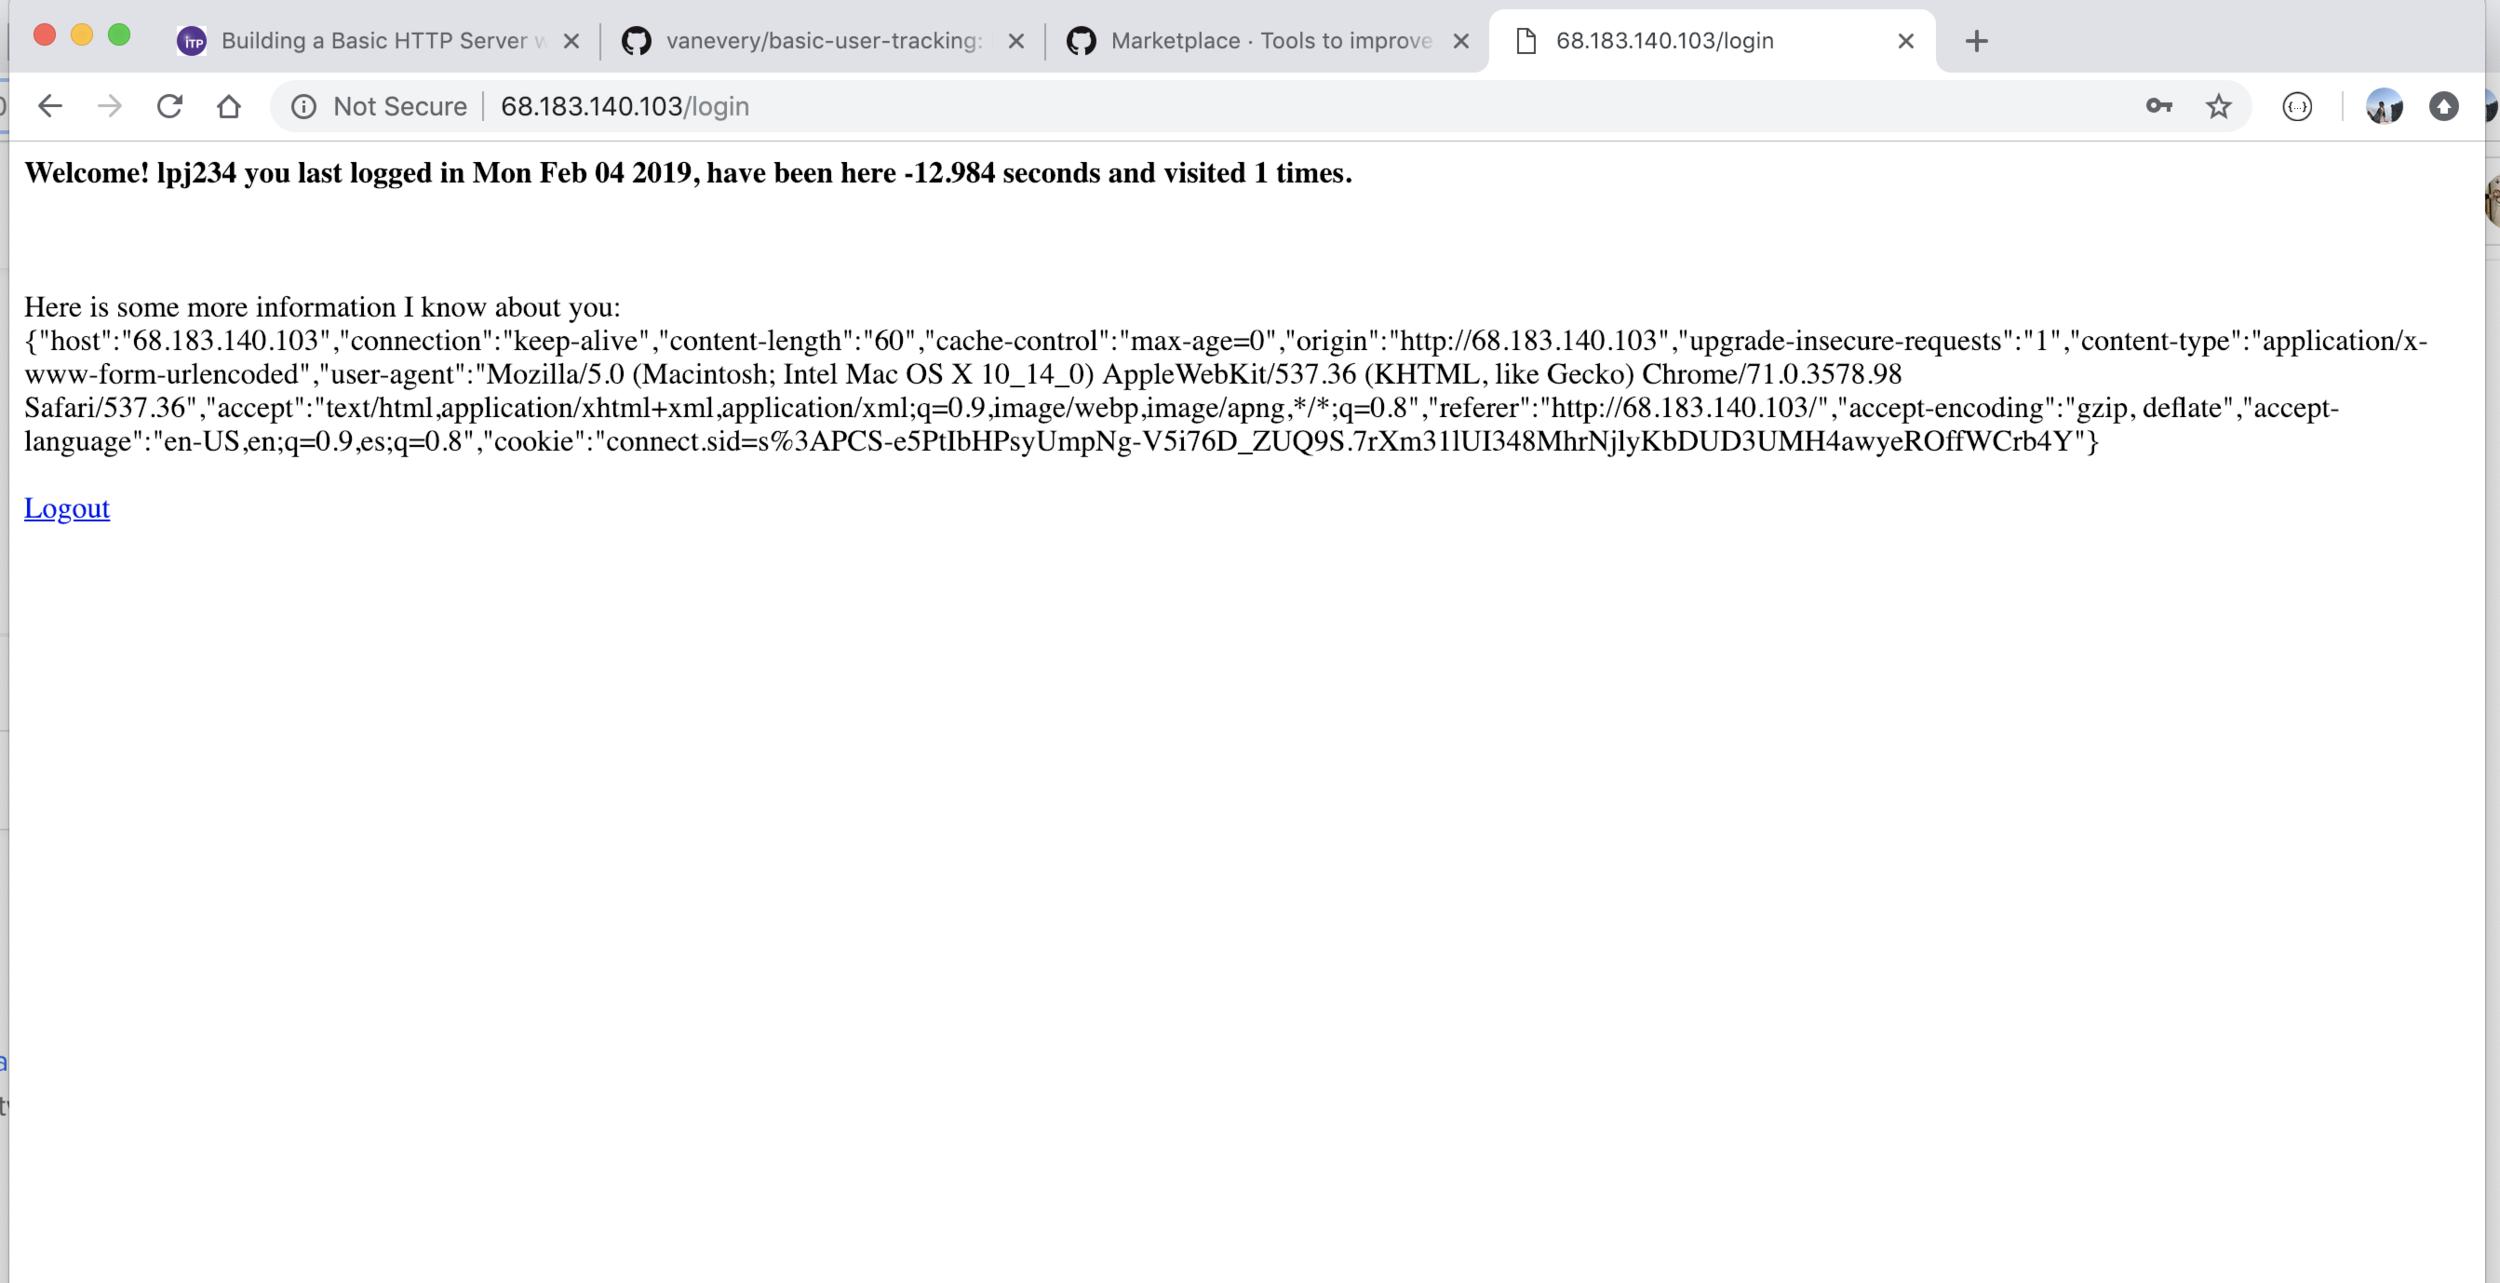 Screenshot 2019-02-04 12.06.15.png